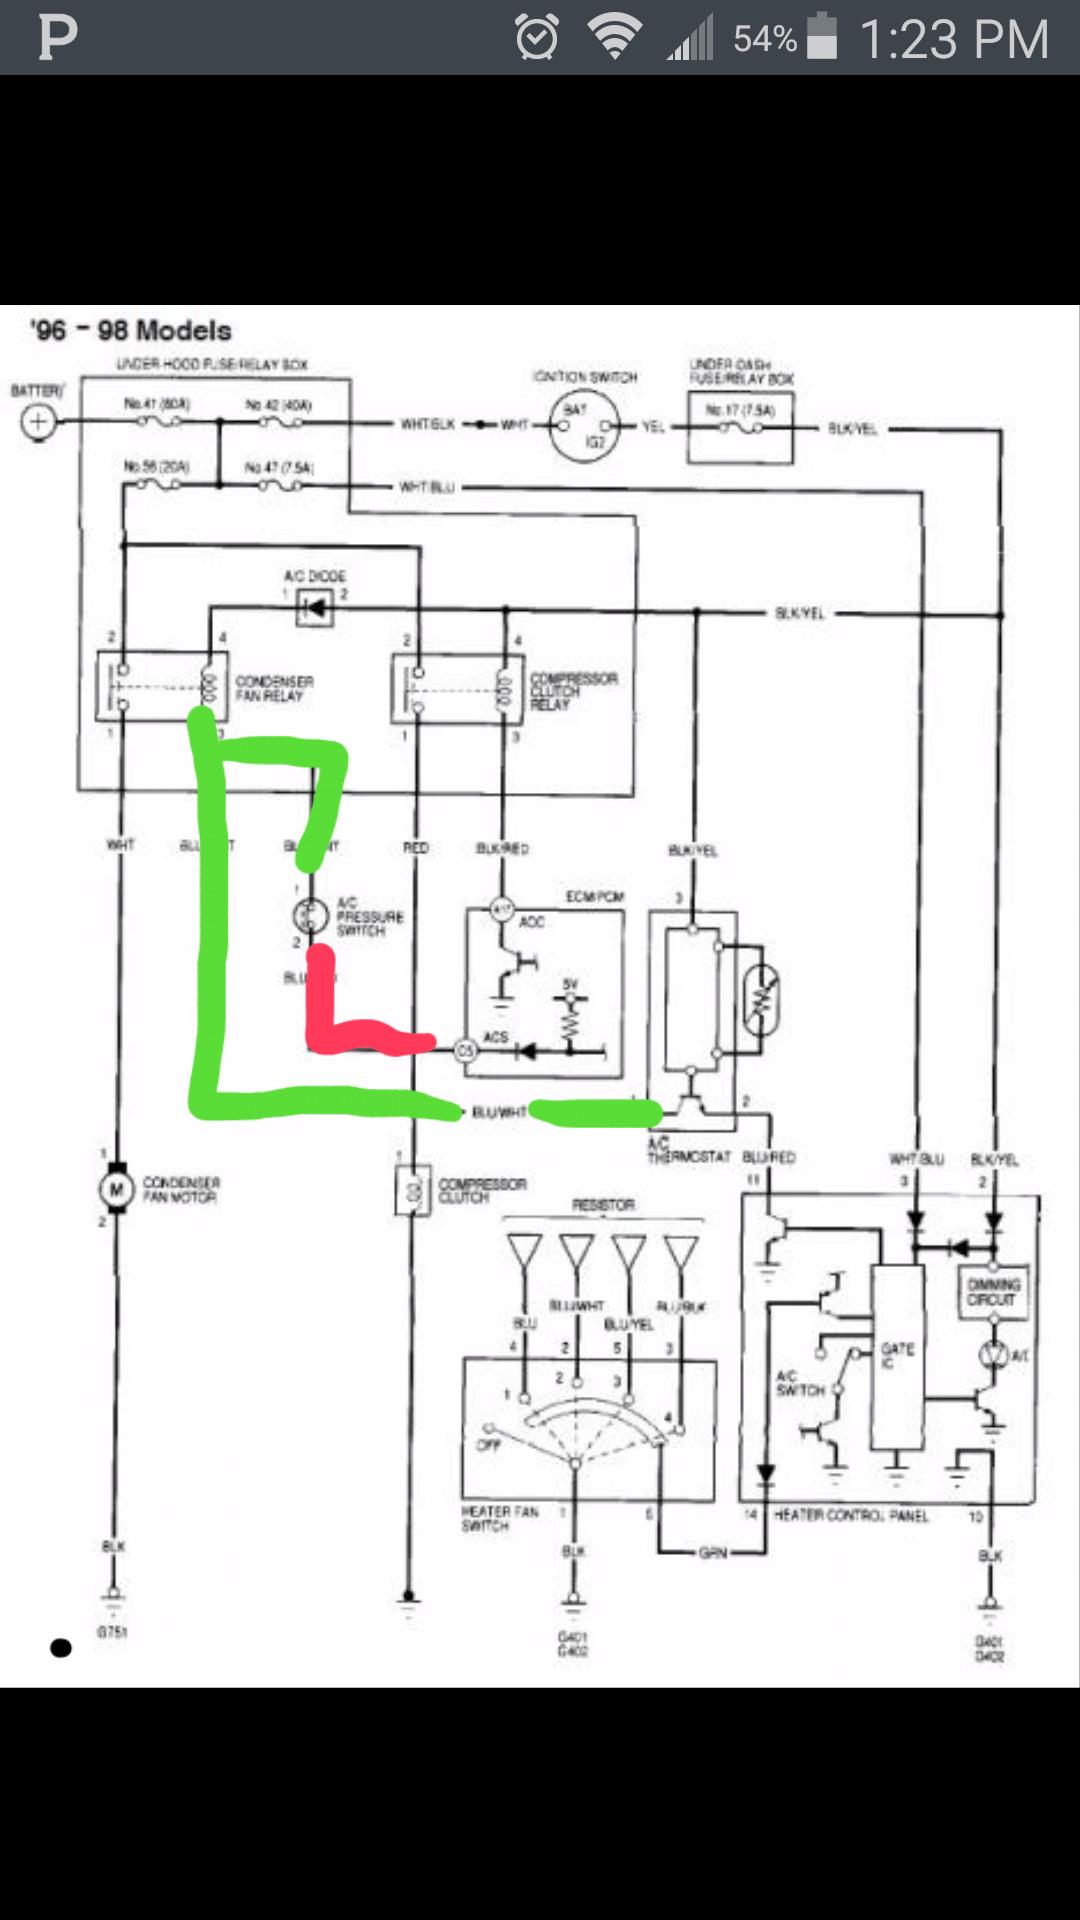 No Ac Heater Control Panel